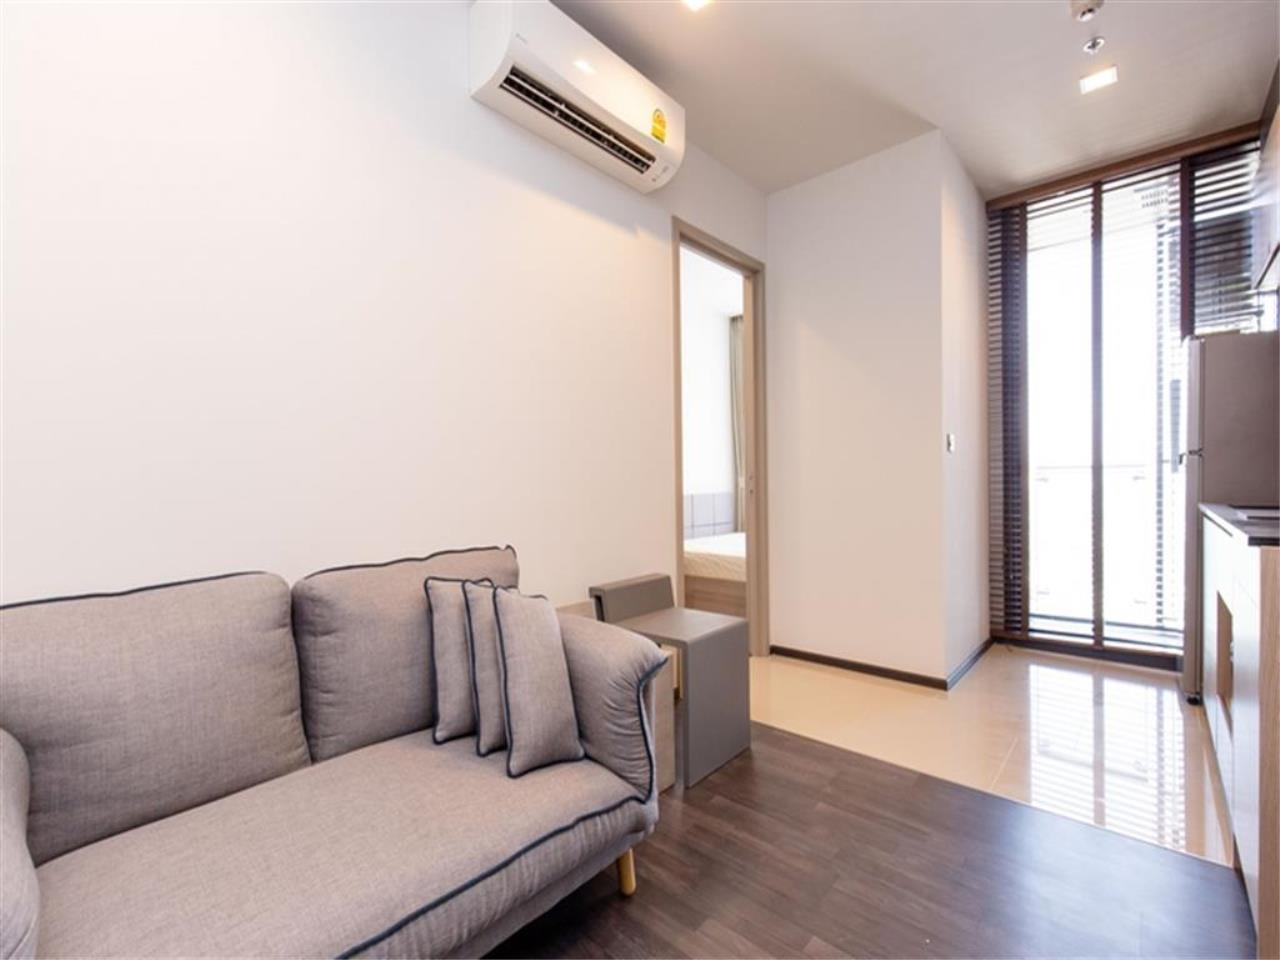 Plus Property Agency's Rent : CD190239 THE LINE ASOKE-RATCHADA Condominium New Petchburi - Rama 9 Bangkok 18